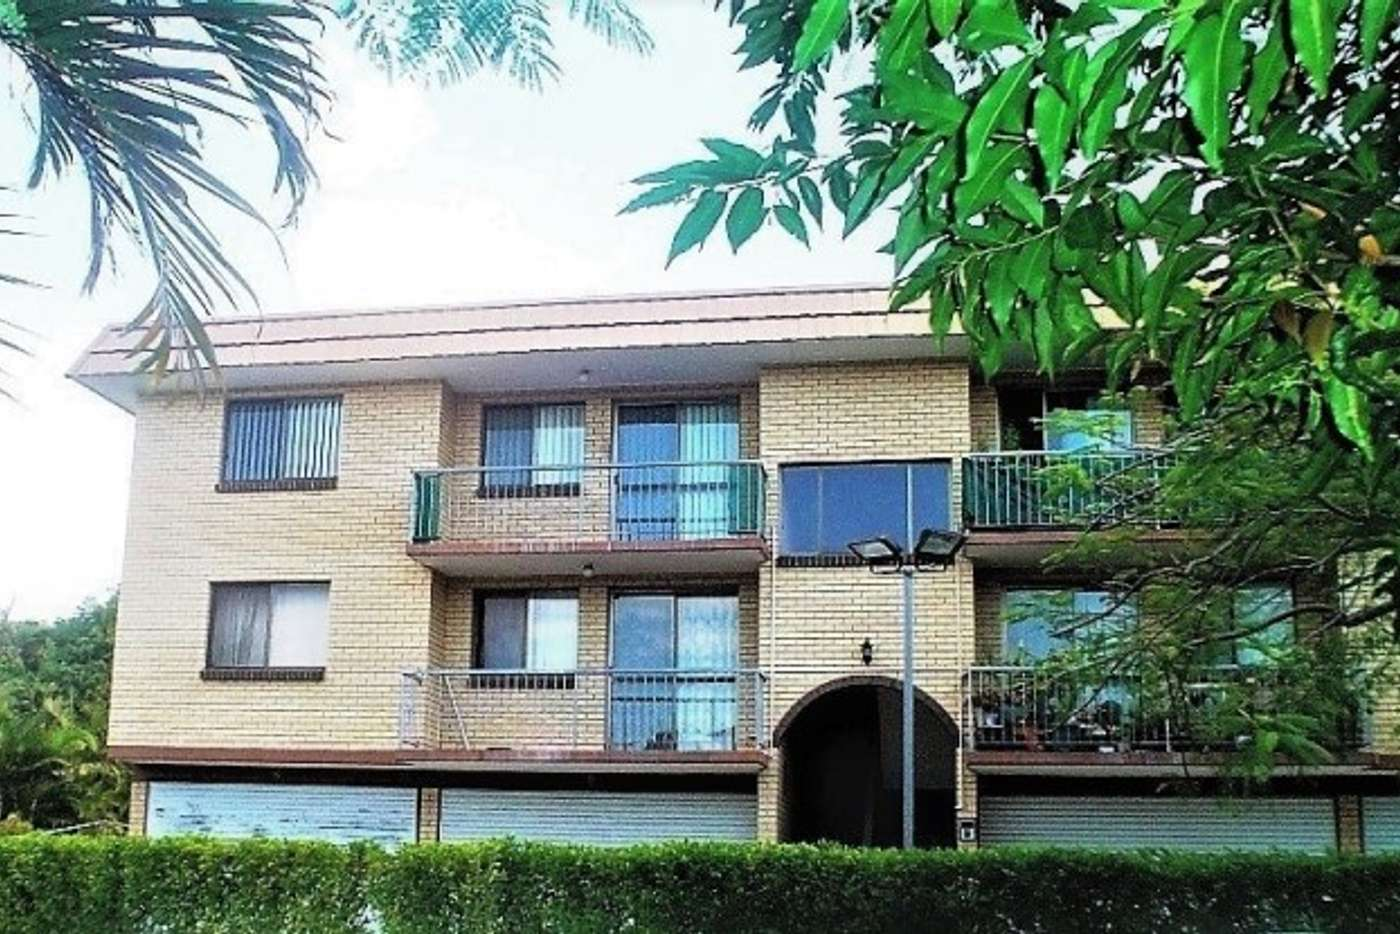 Main view of Homely unit listing, 4/17 Sydney Street, New Farm QLD 4005